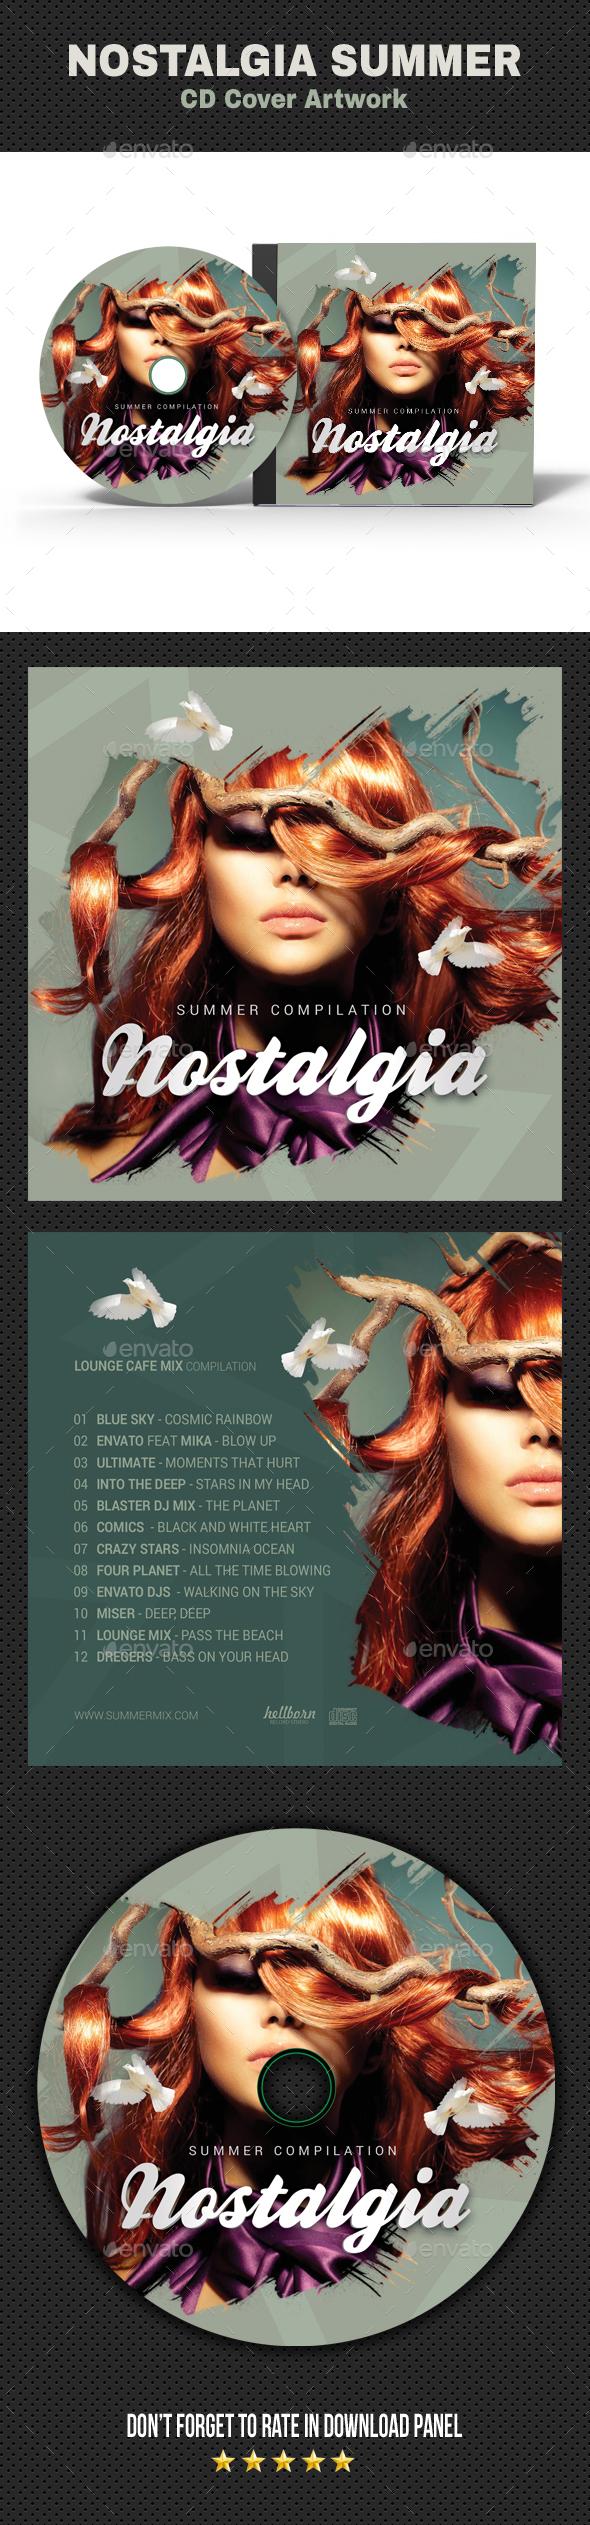 Nostalgia CD Cover - CD & DVD Artwork Print Templates